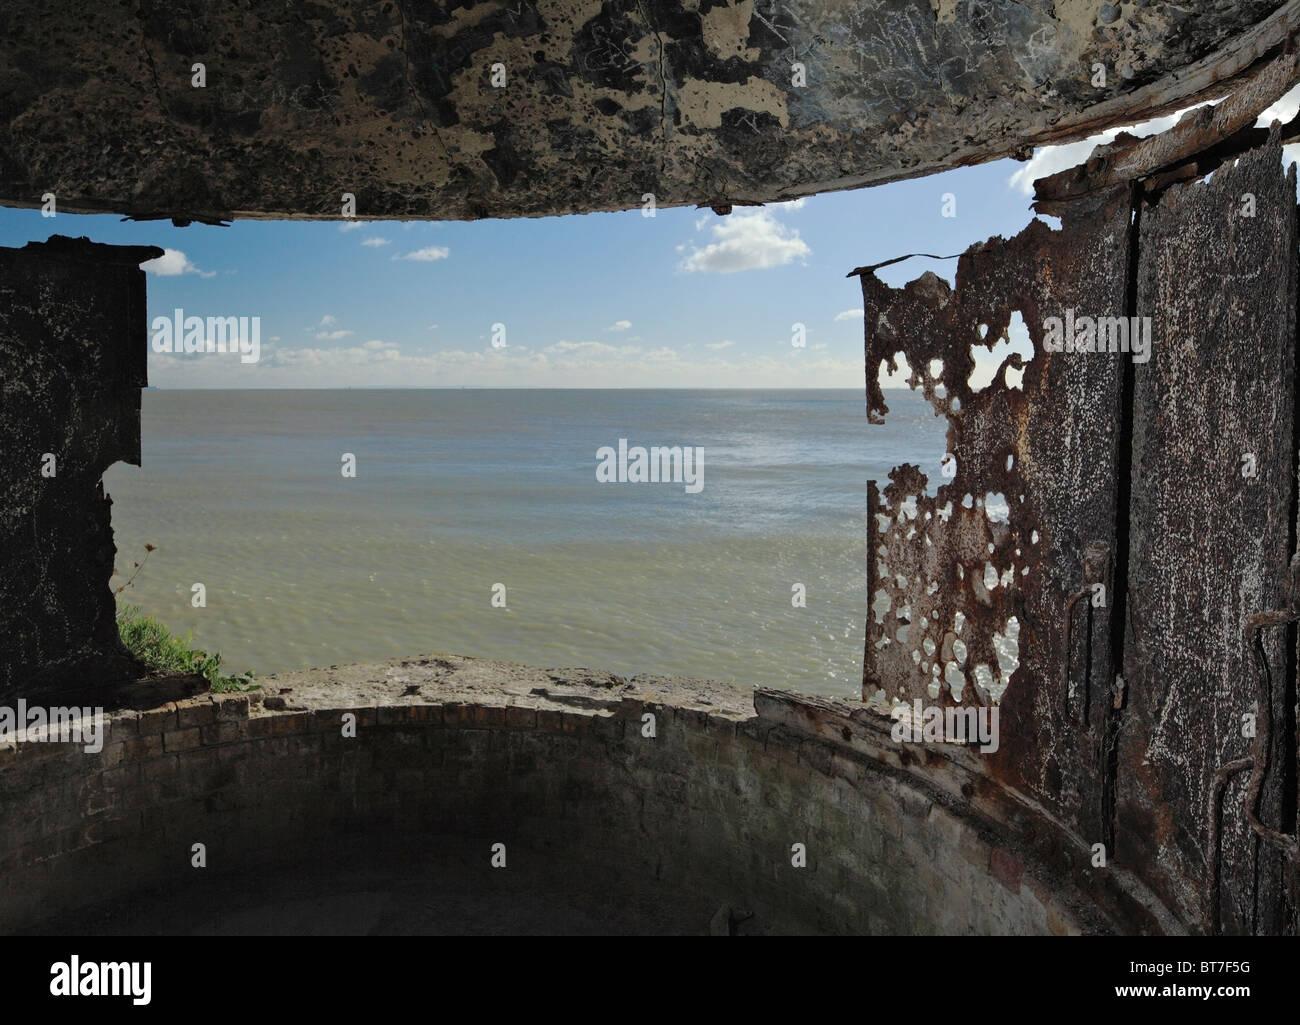 World War I & II searchlight Battery at Langdon Bay, Dover Cliffs, Kent, England, UK. - Stock Image